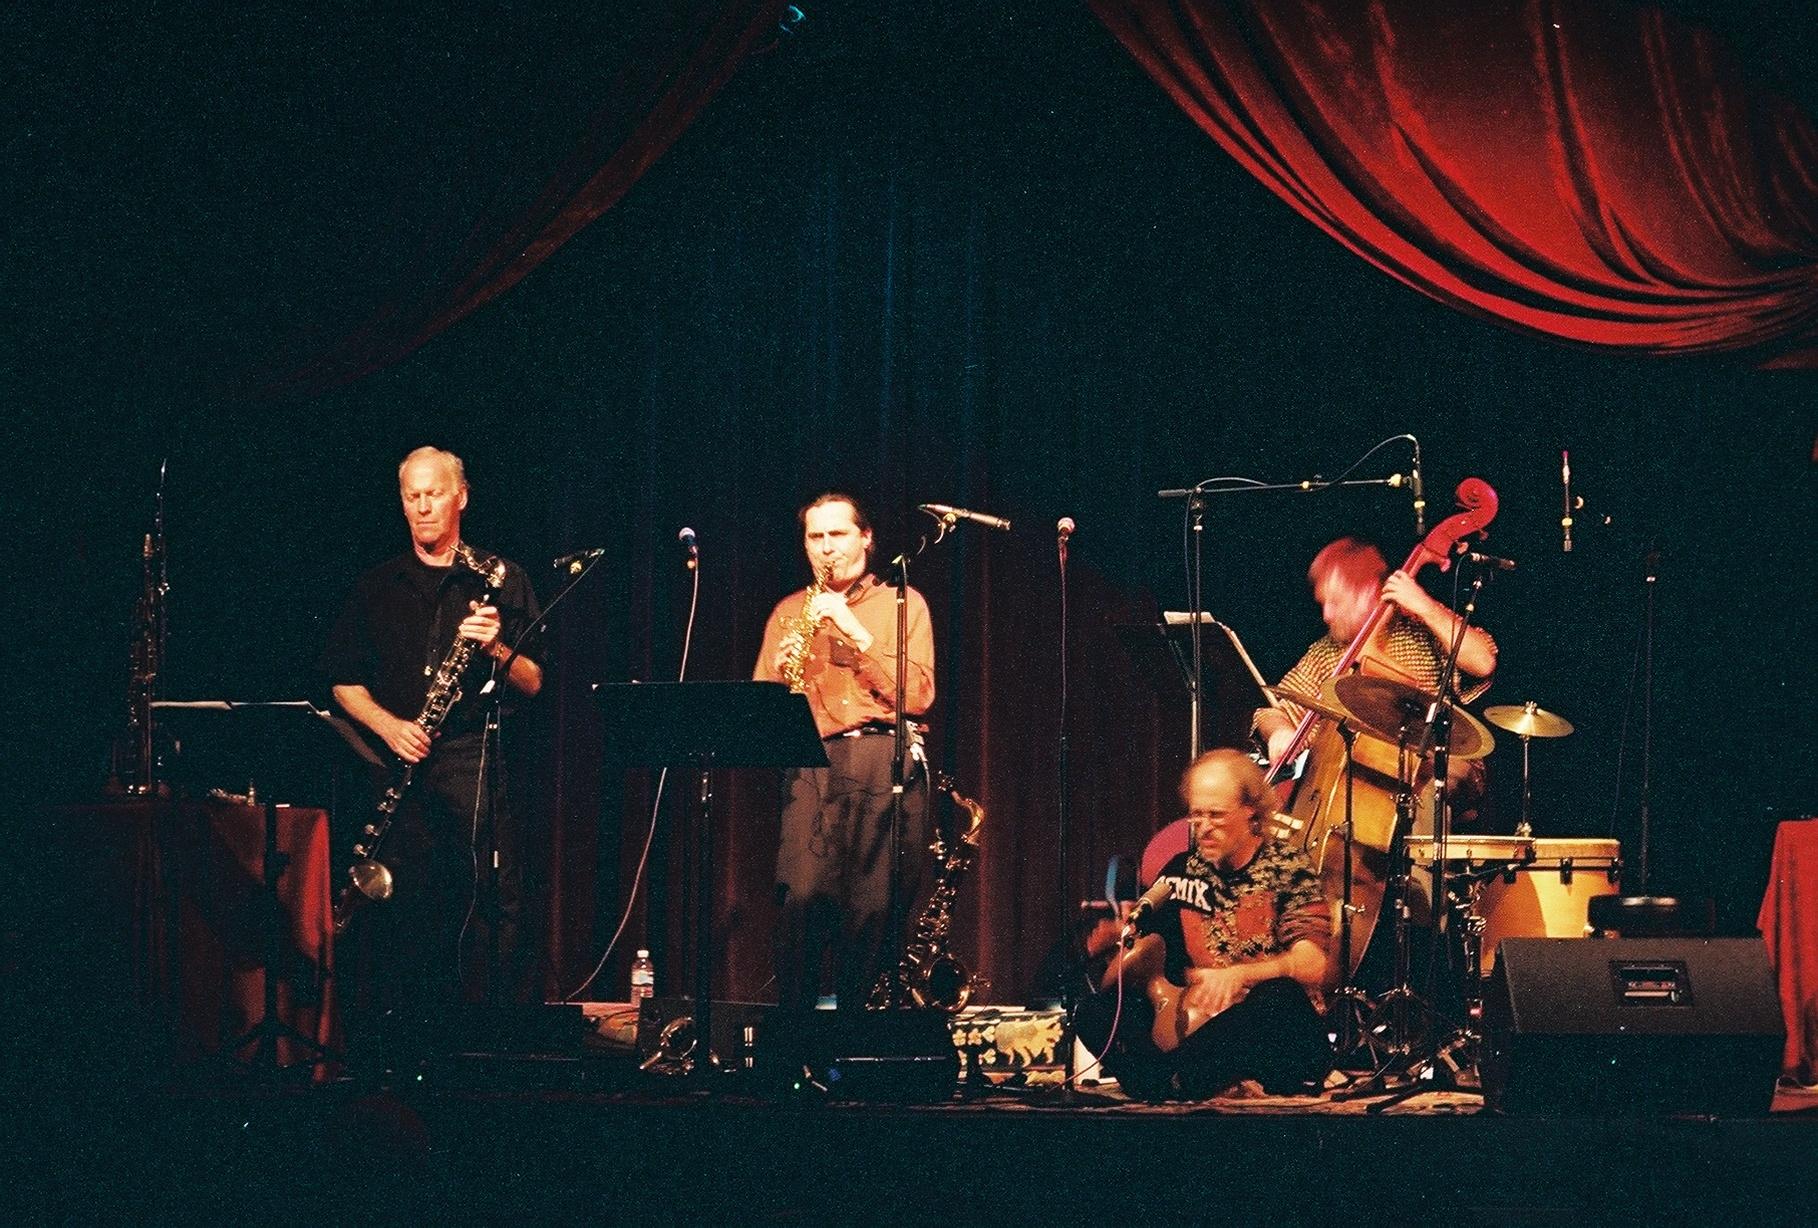 Hemispheres in Concert at the Throckmorton Theatre